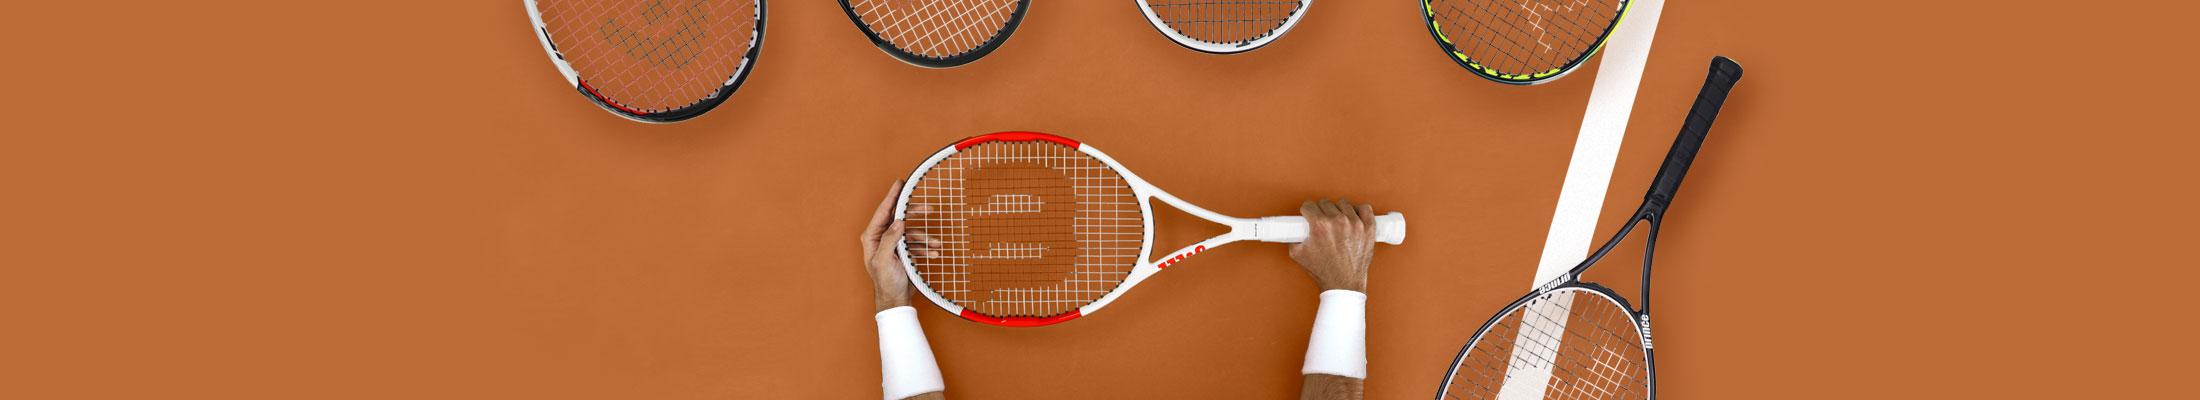 Choose your Tennis Racket